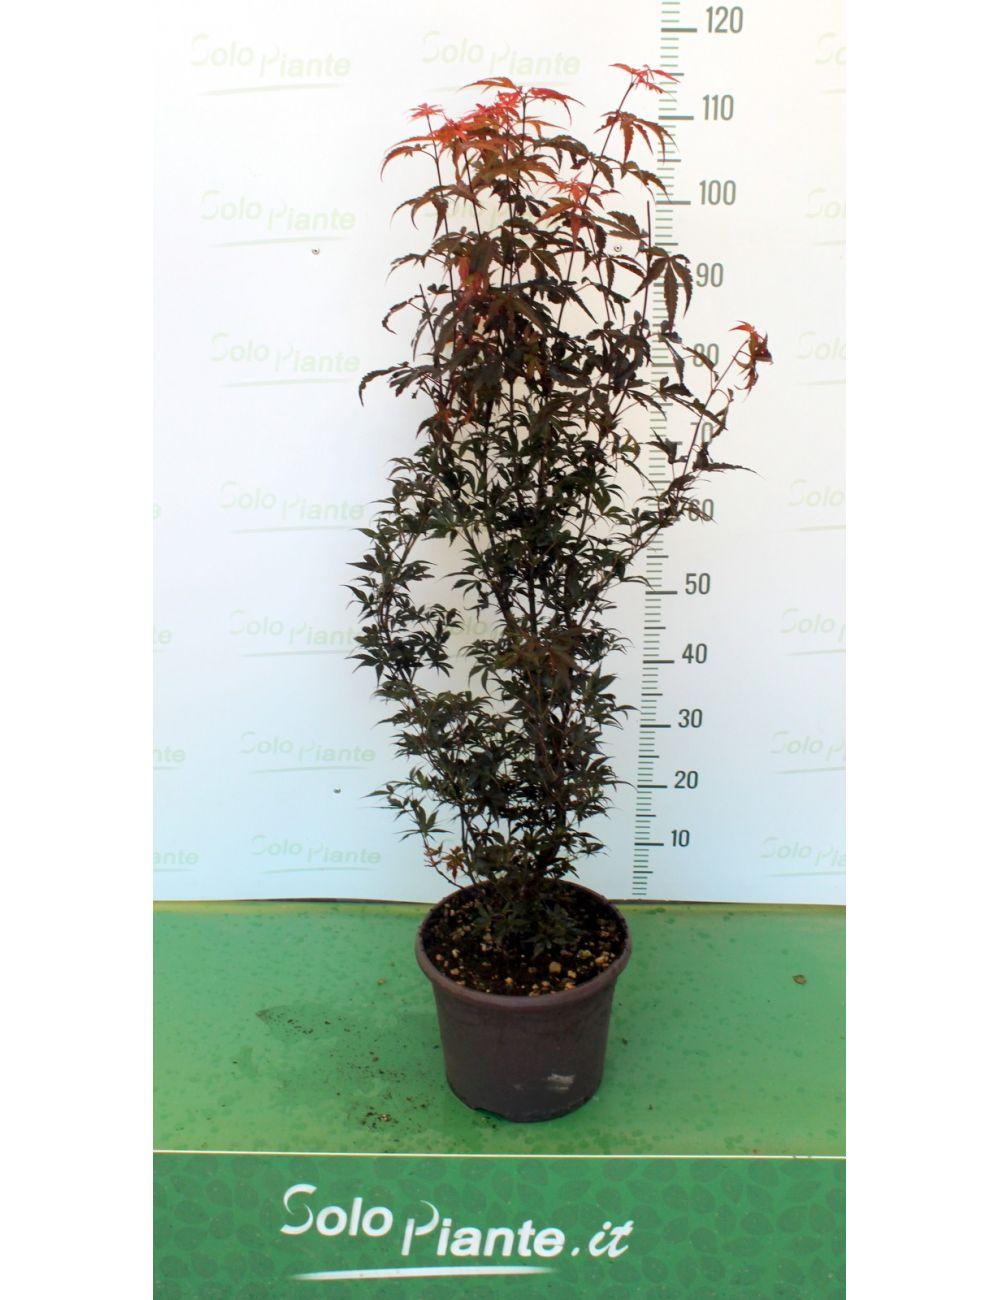 Acer palmatum skeeters broom vendita piante on line for Acero giapponese in vaso